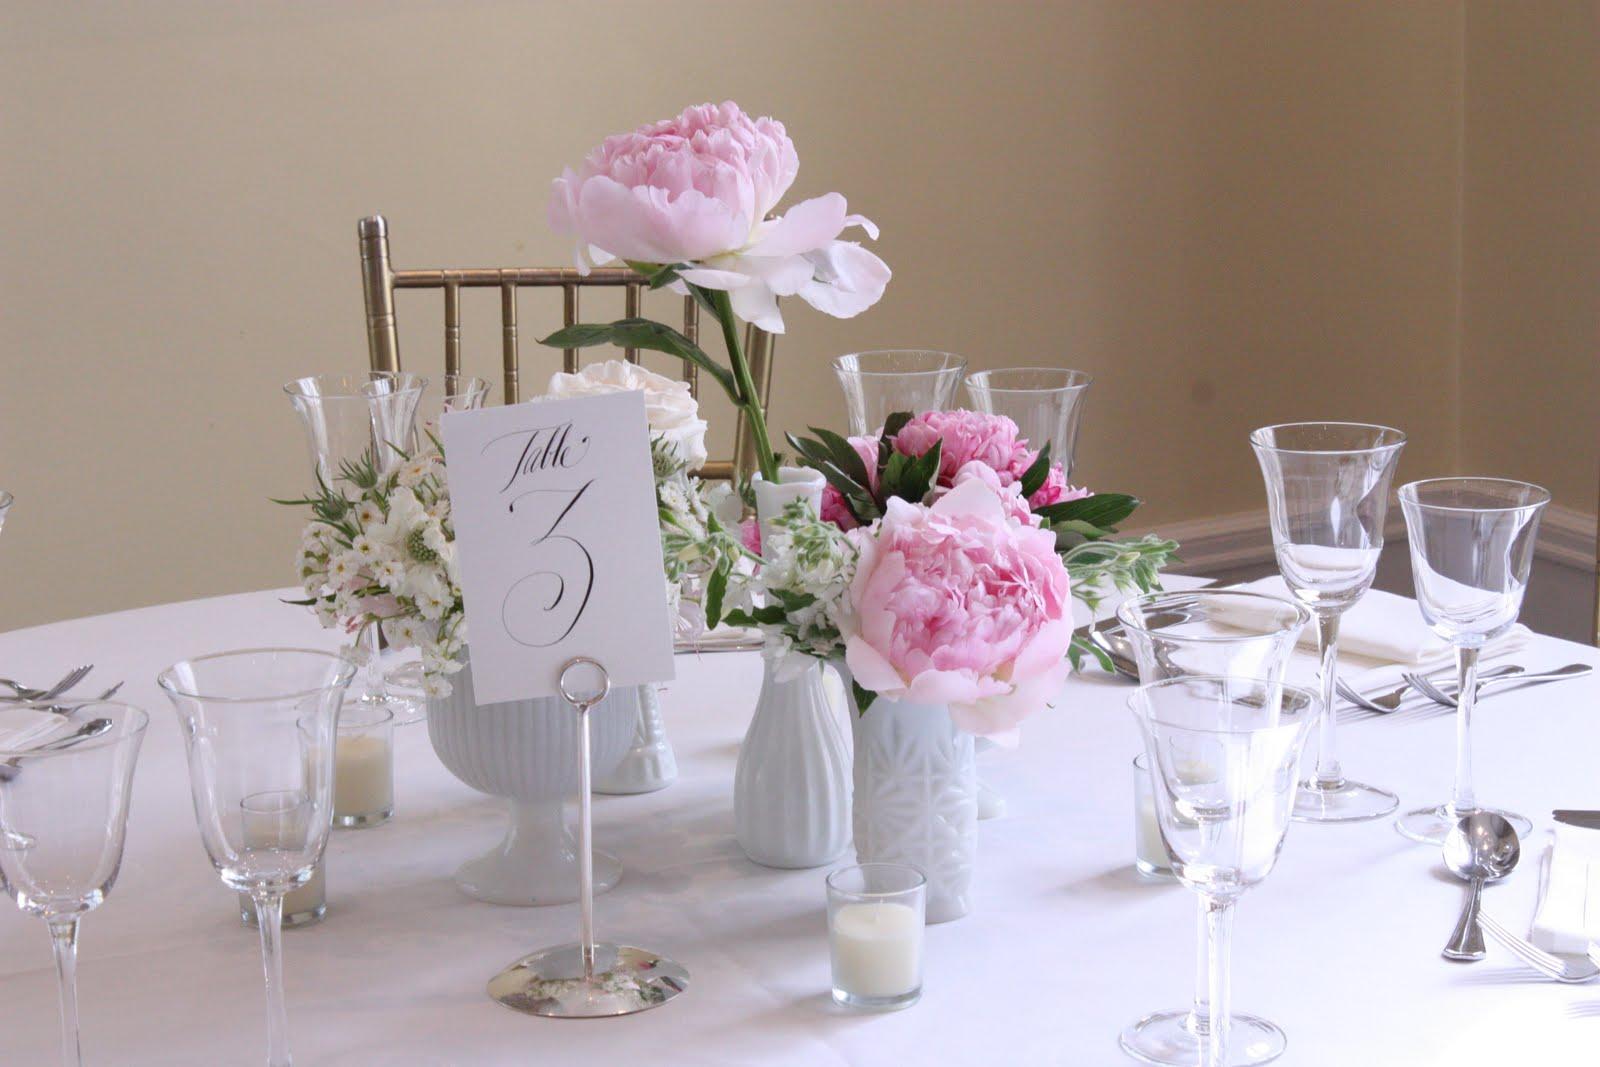 BLUSH Floral Design: Milk Glass Wedding At Wadsworth Mansion